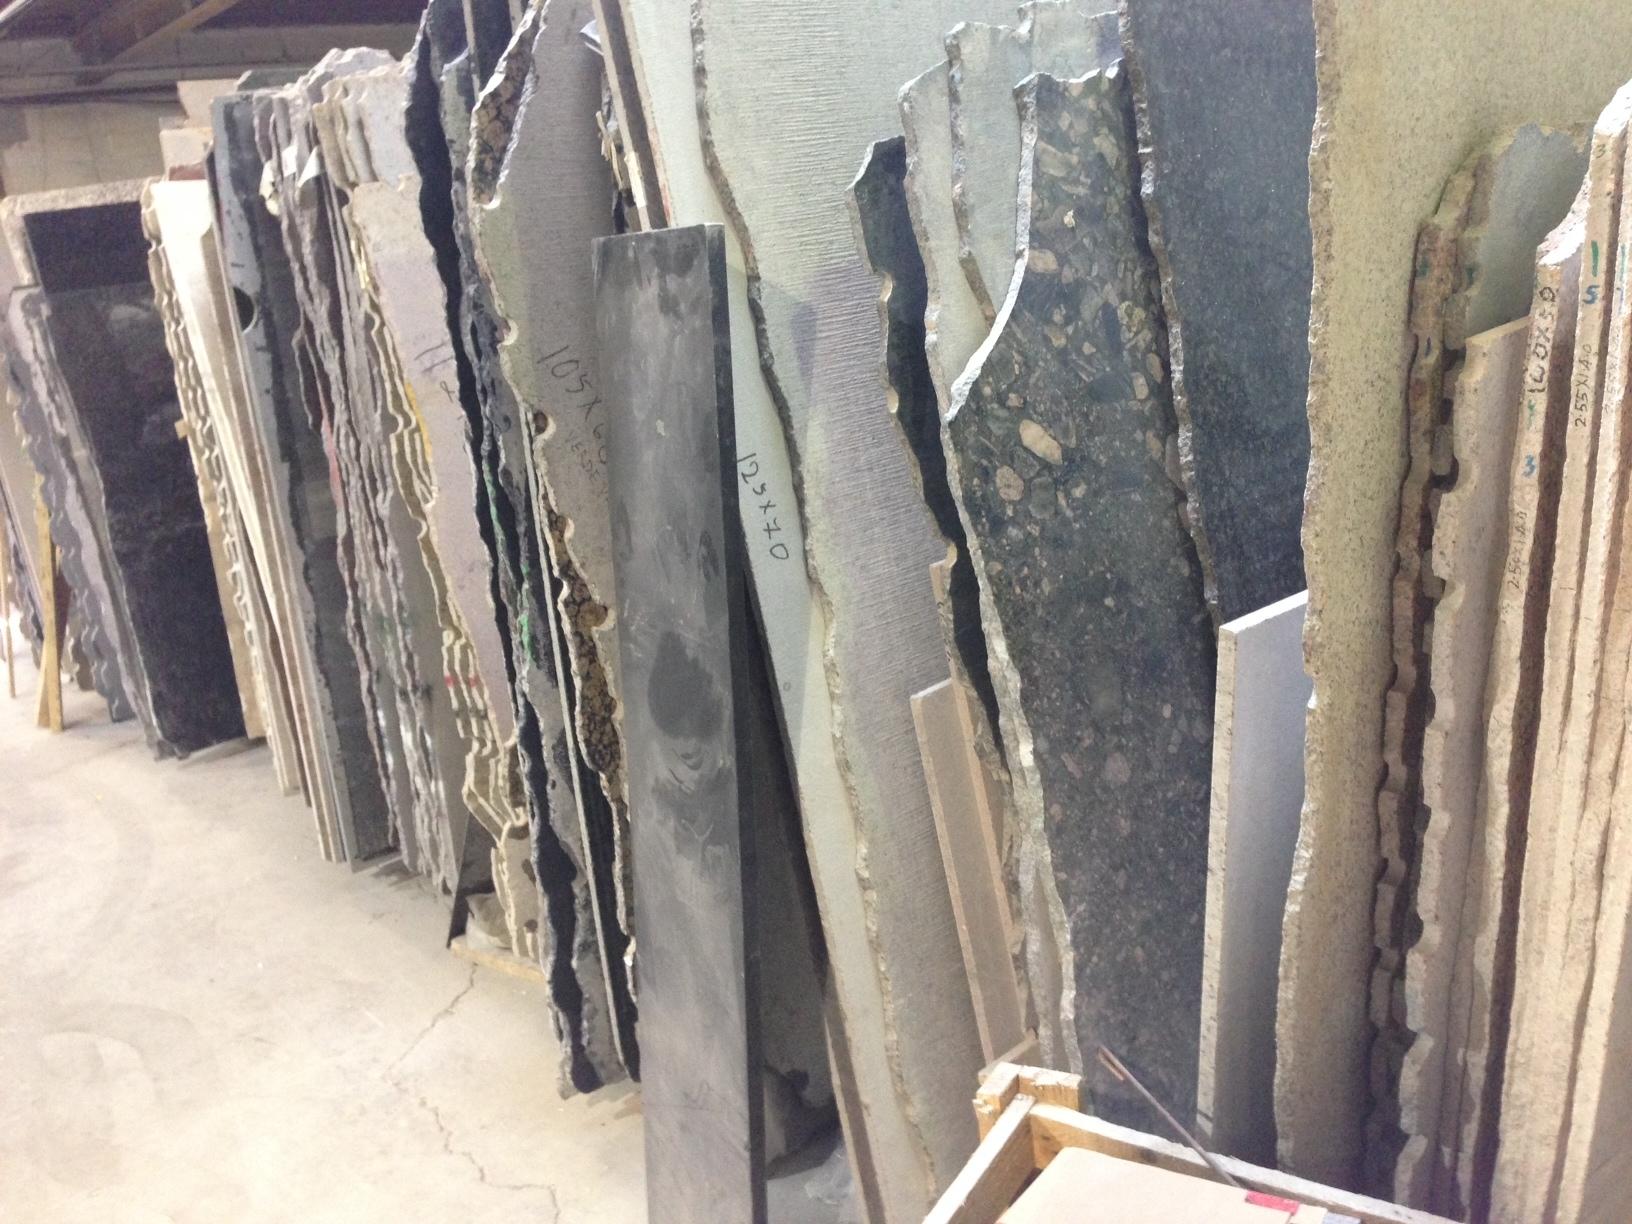 UPPER CANADA Marble & Granite Manufacturing